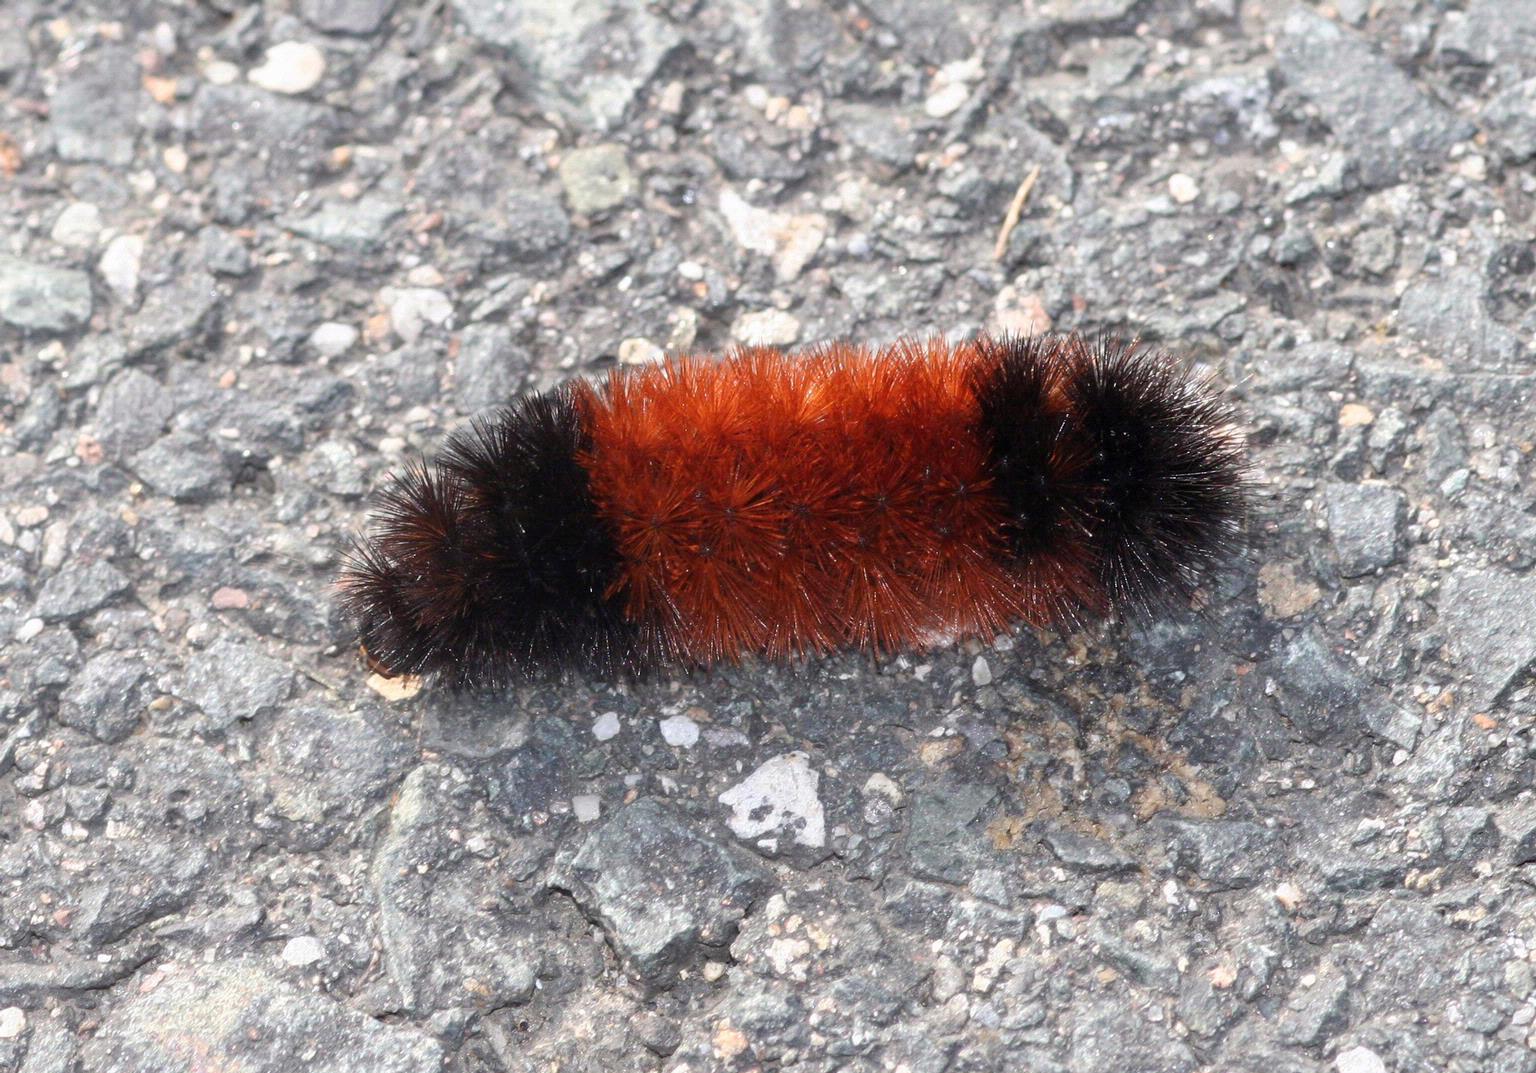 Woolly bear caterpillar.